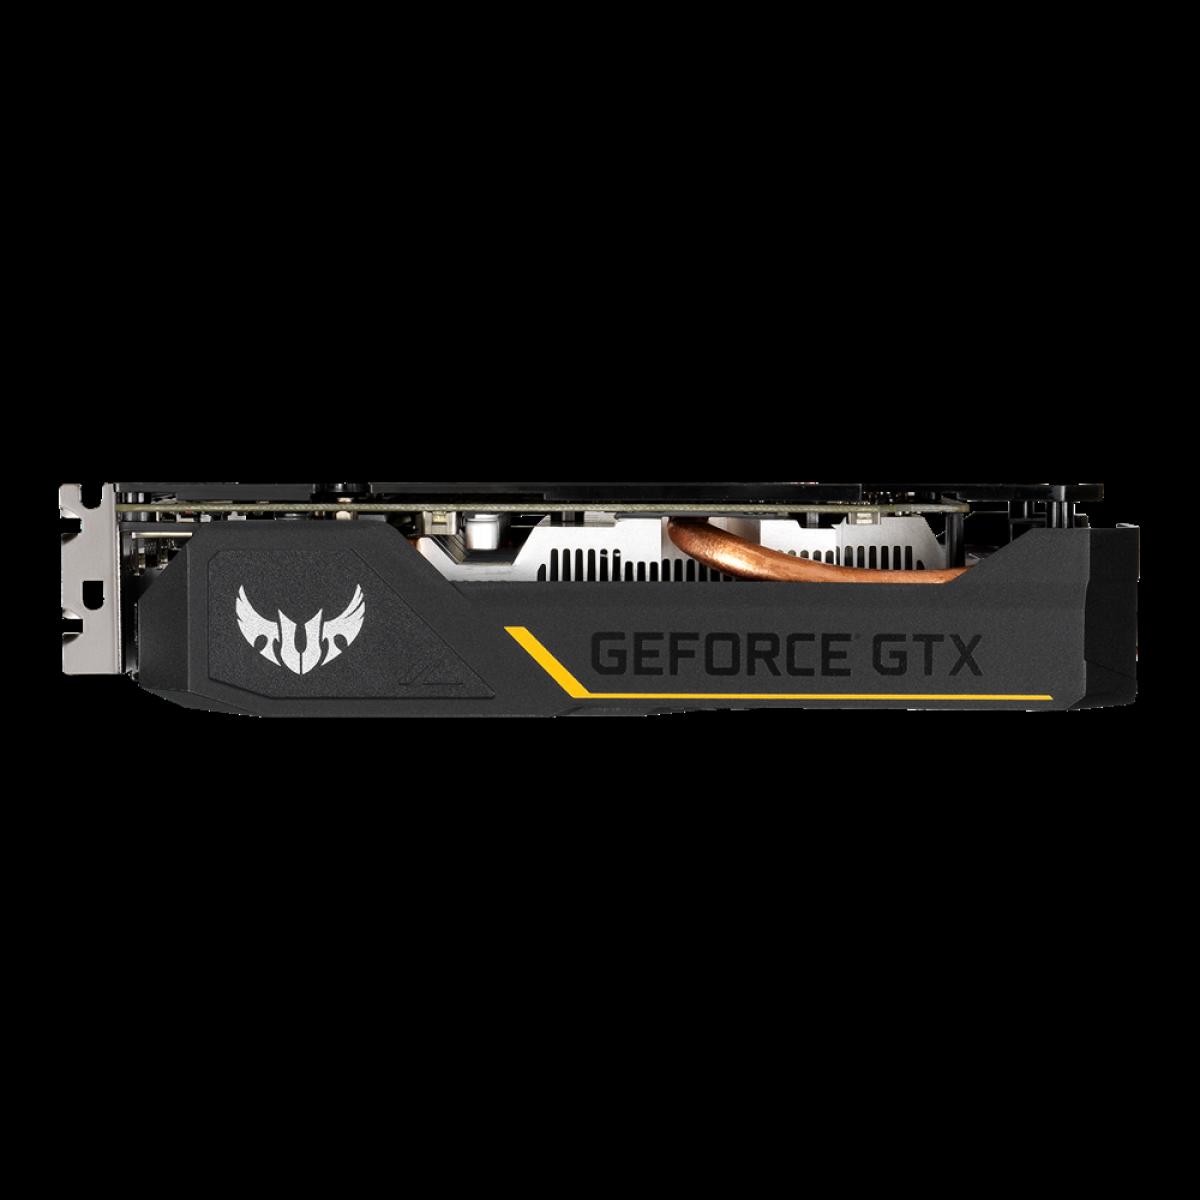 Placa de Vídeo Asus, TUF Gaming GeForce, GTX 1650 Dual, 4GB, GDDR6, 128Bit, TUF-GTX1650-4GD6-GAMING